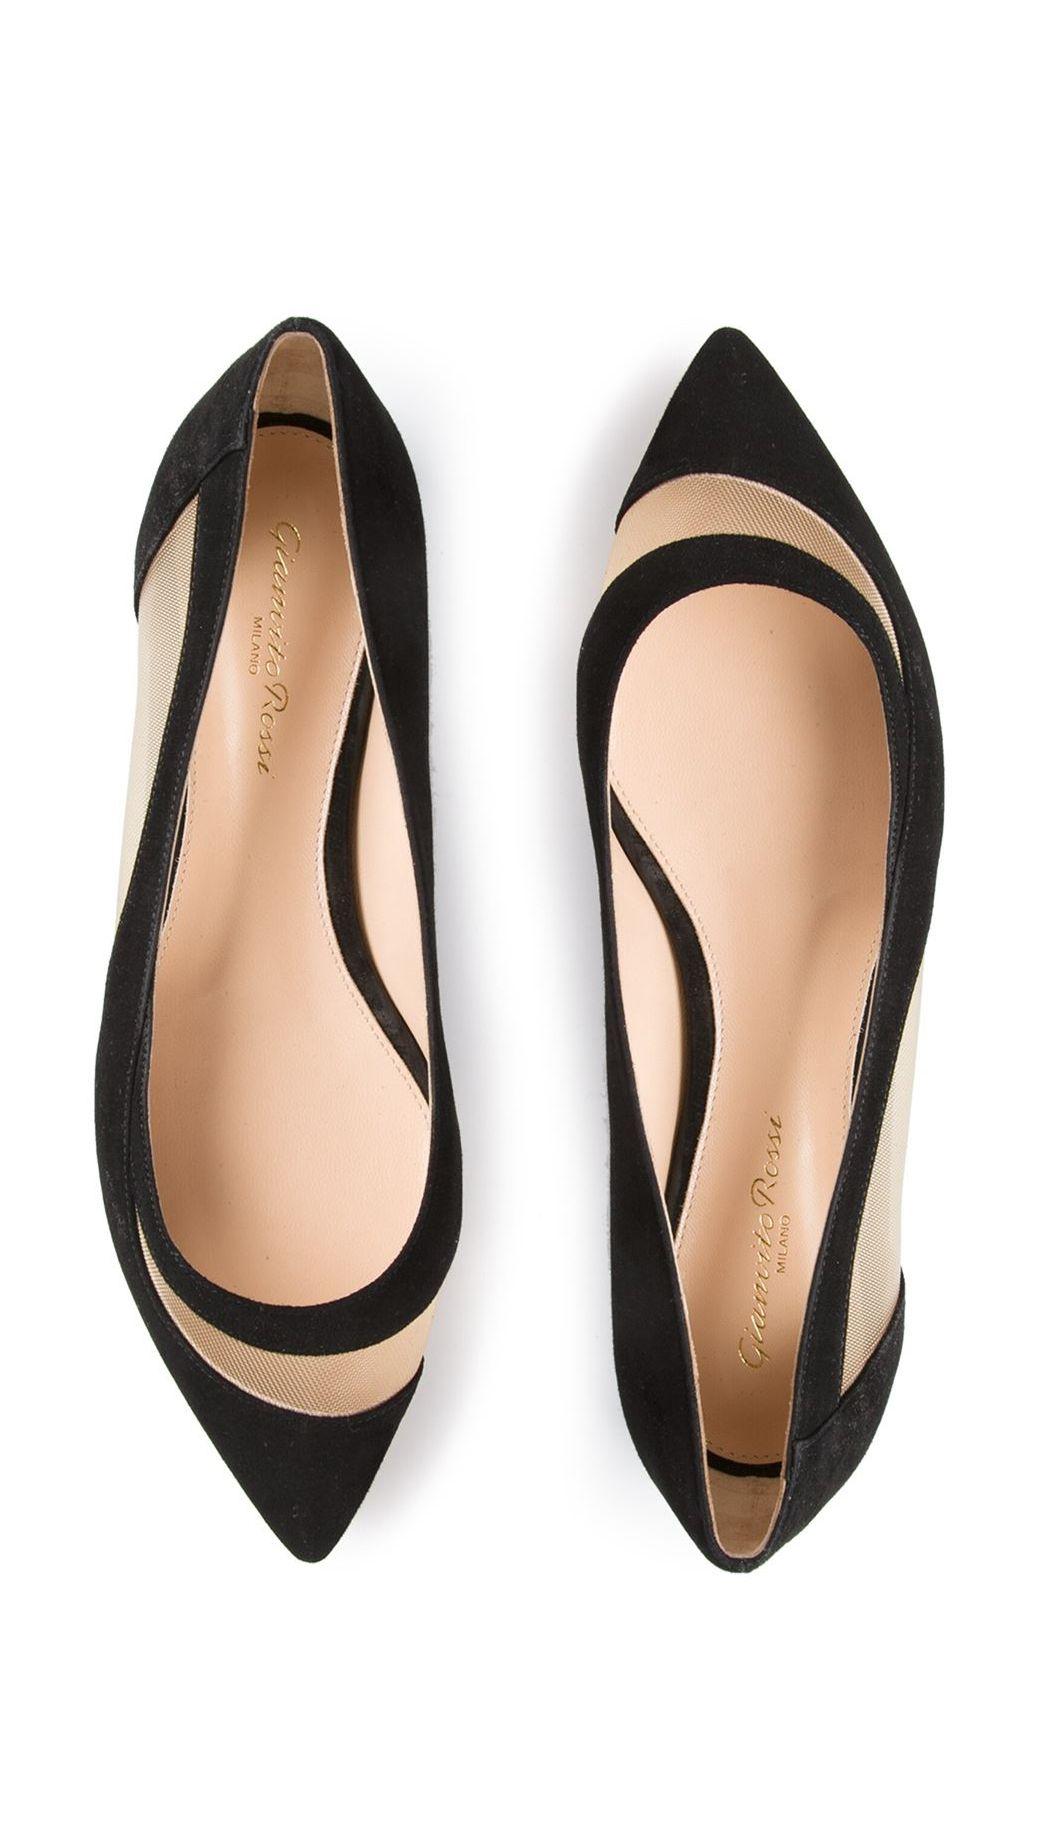 Ballerina Flats / GIANVITO ROSSI